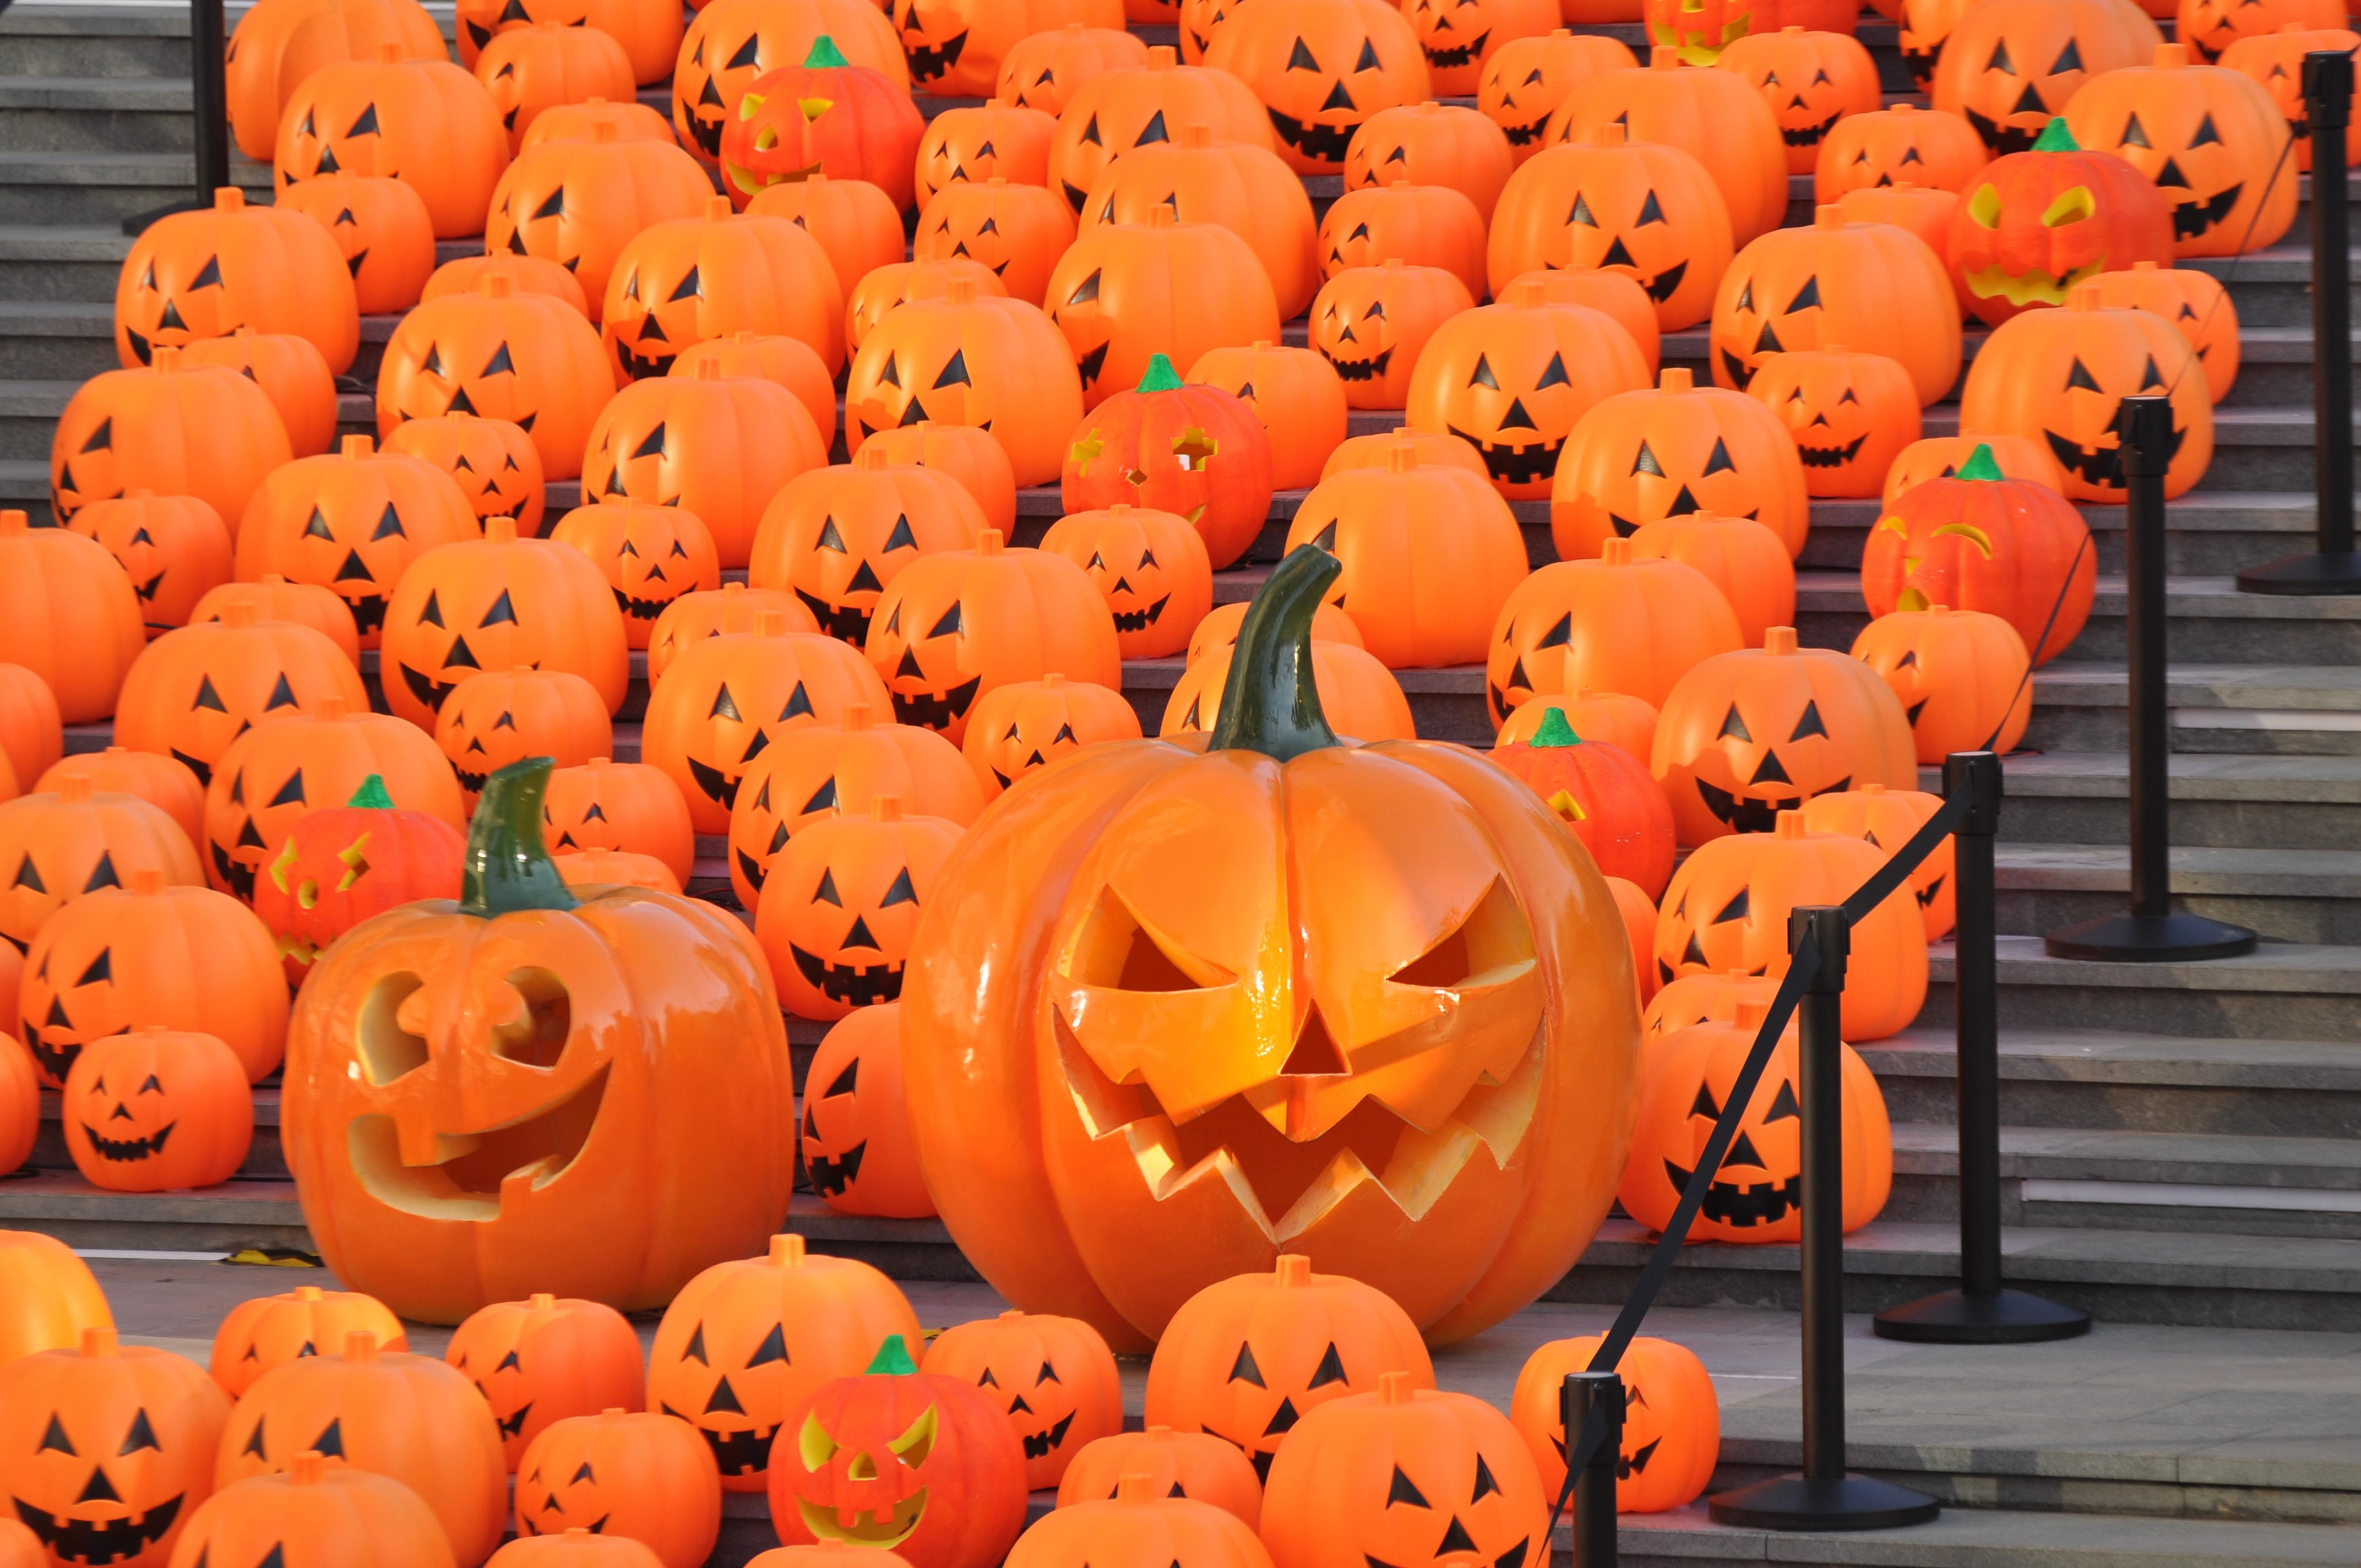 China Welcomes Halloween Day